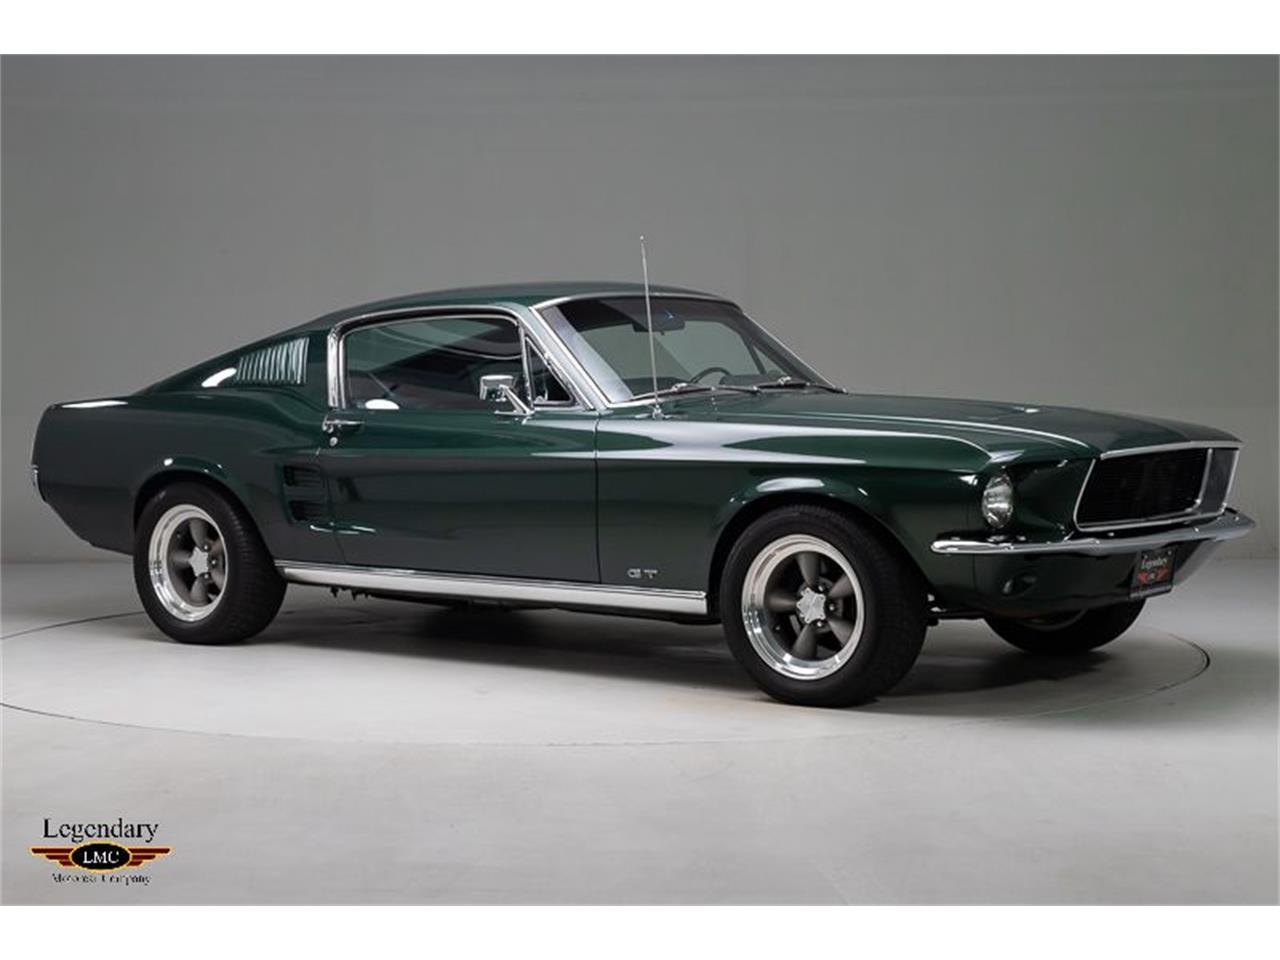 Ford Mustang Bullitt fastback rotisserie1967 prix tout compris 1967